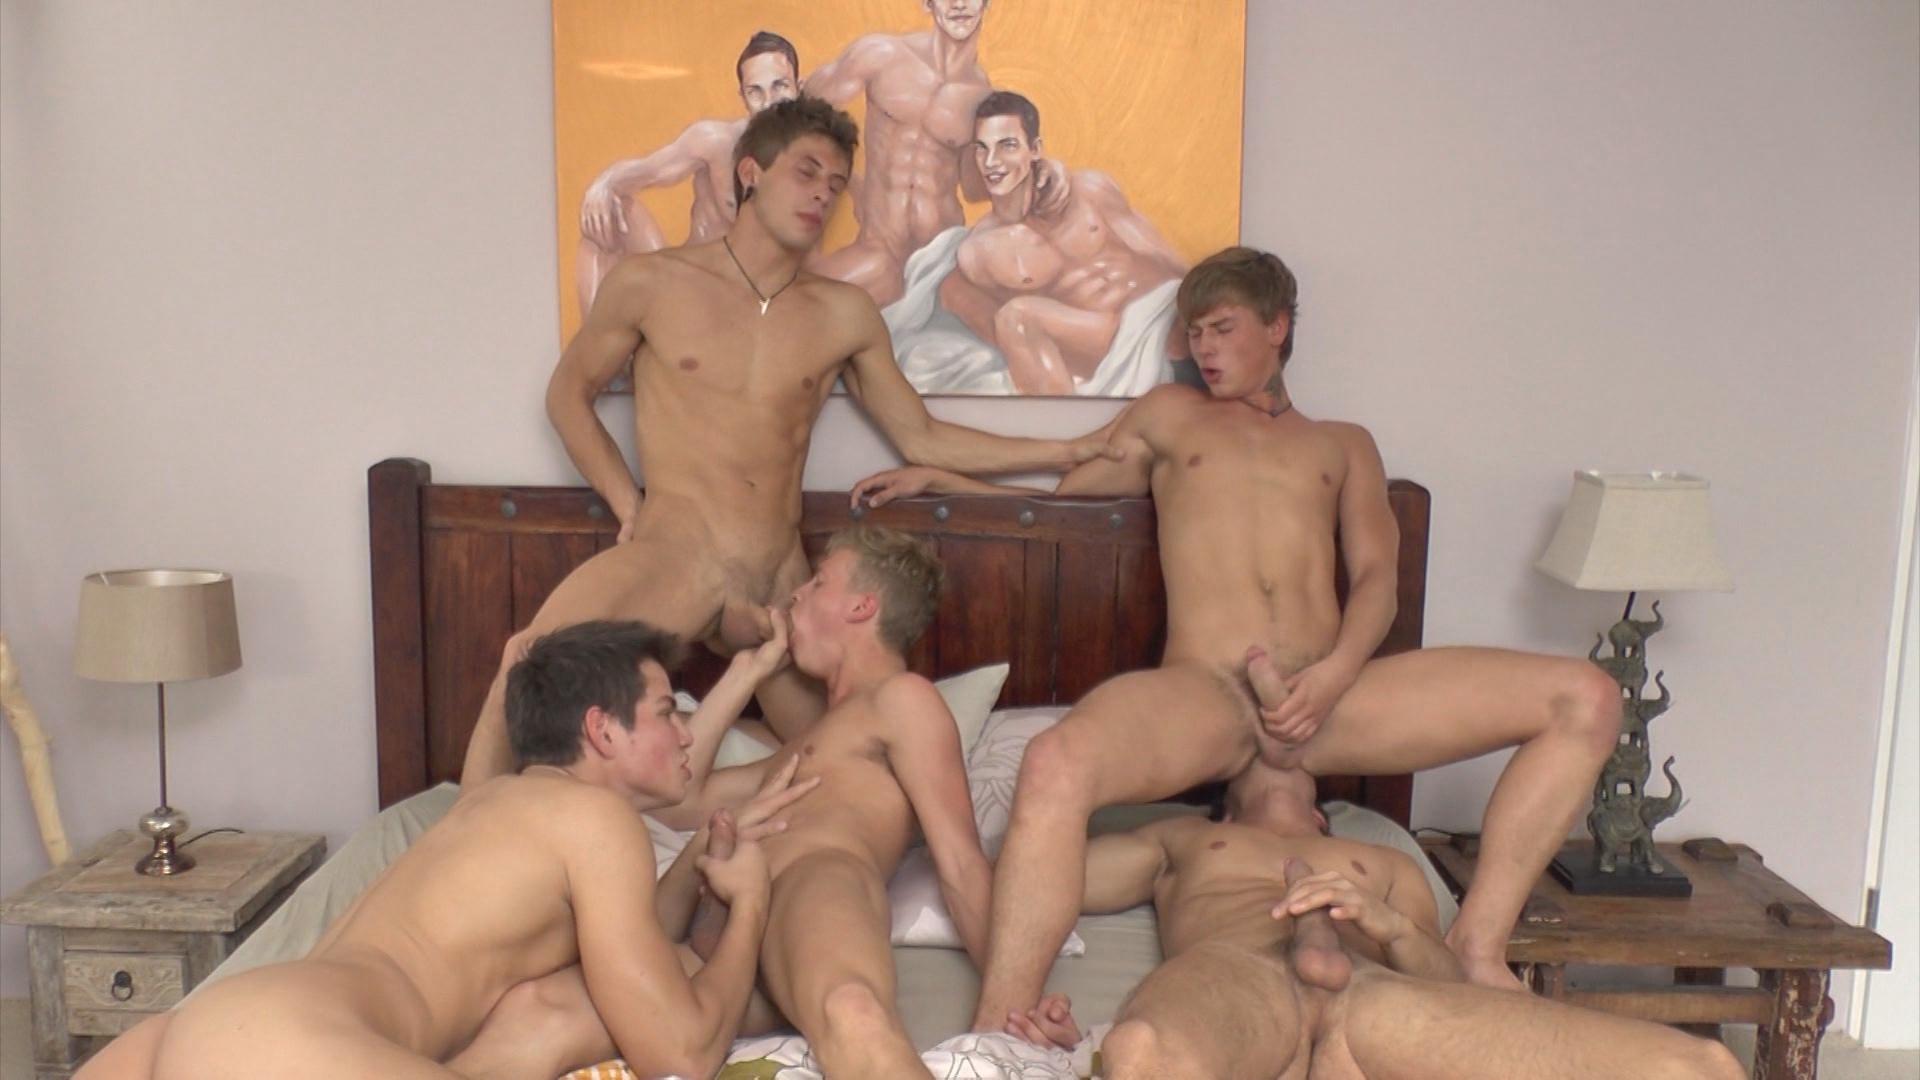 American Lovers 3 Xvideo gay